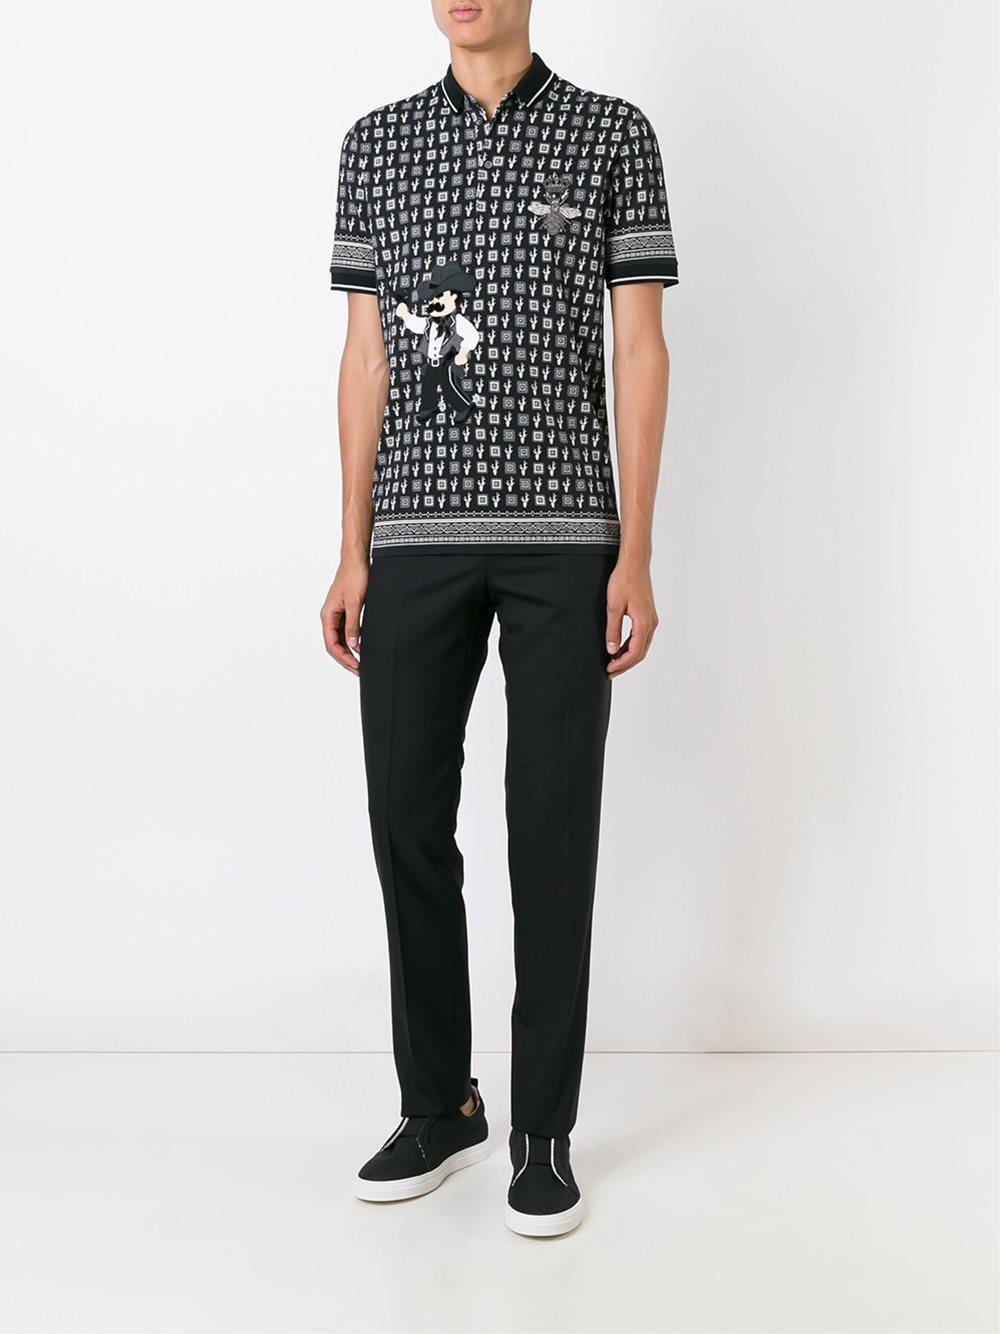 Dolce & Gabbana Cotton Cactus Print Polo Shirt in Black for Men